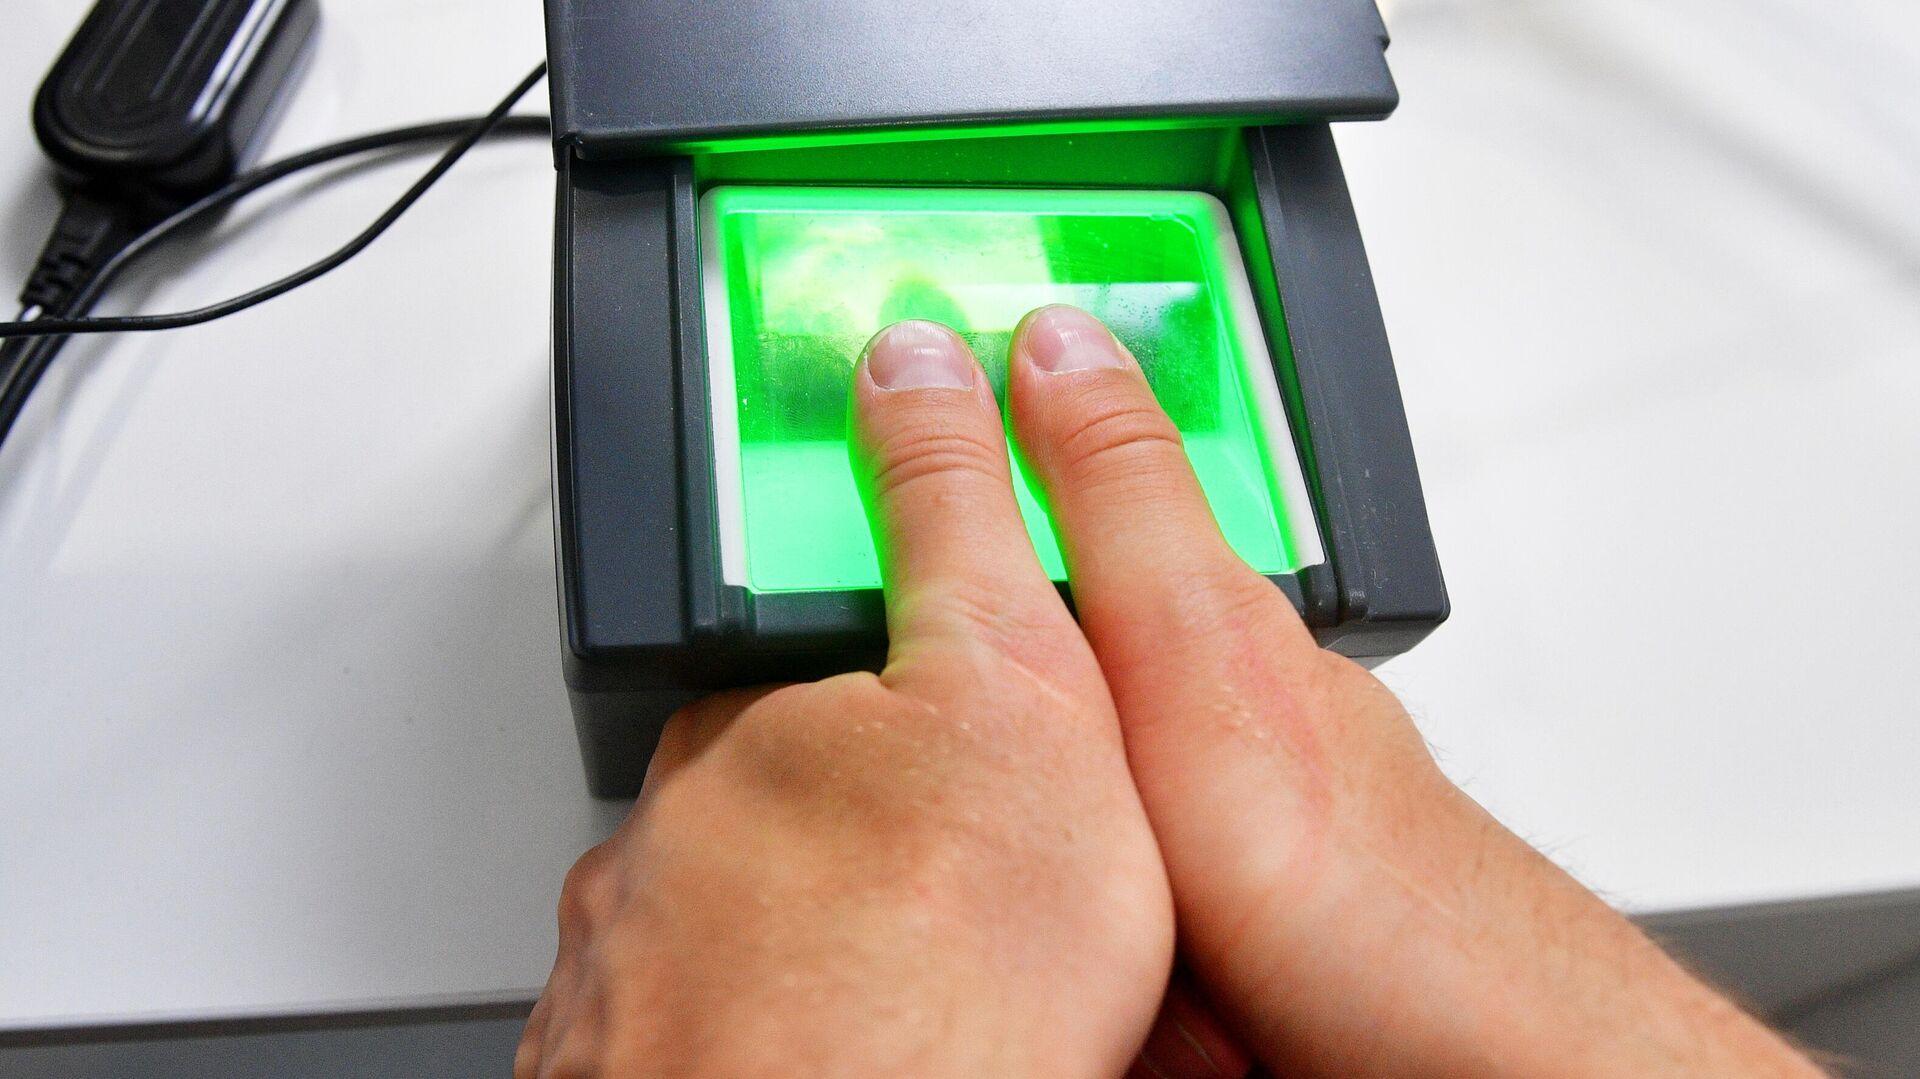 Эксперты заявили о неизбежности утечки биометрии